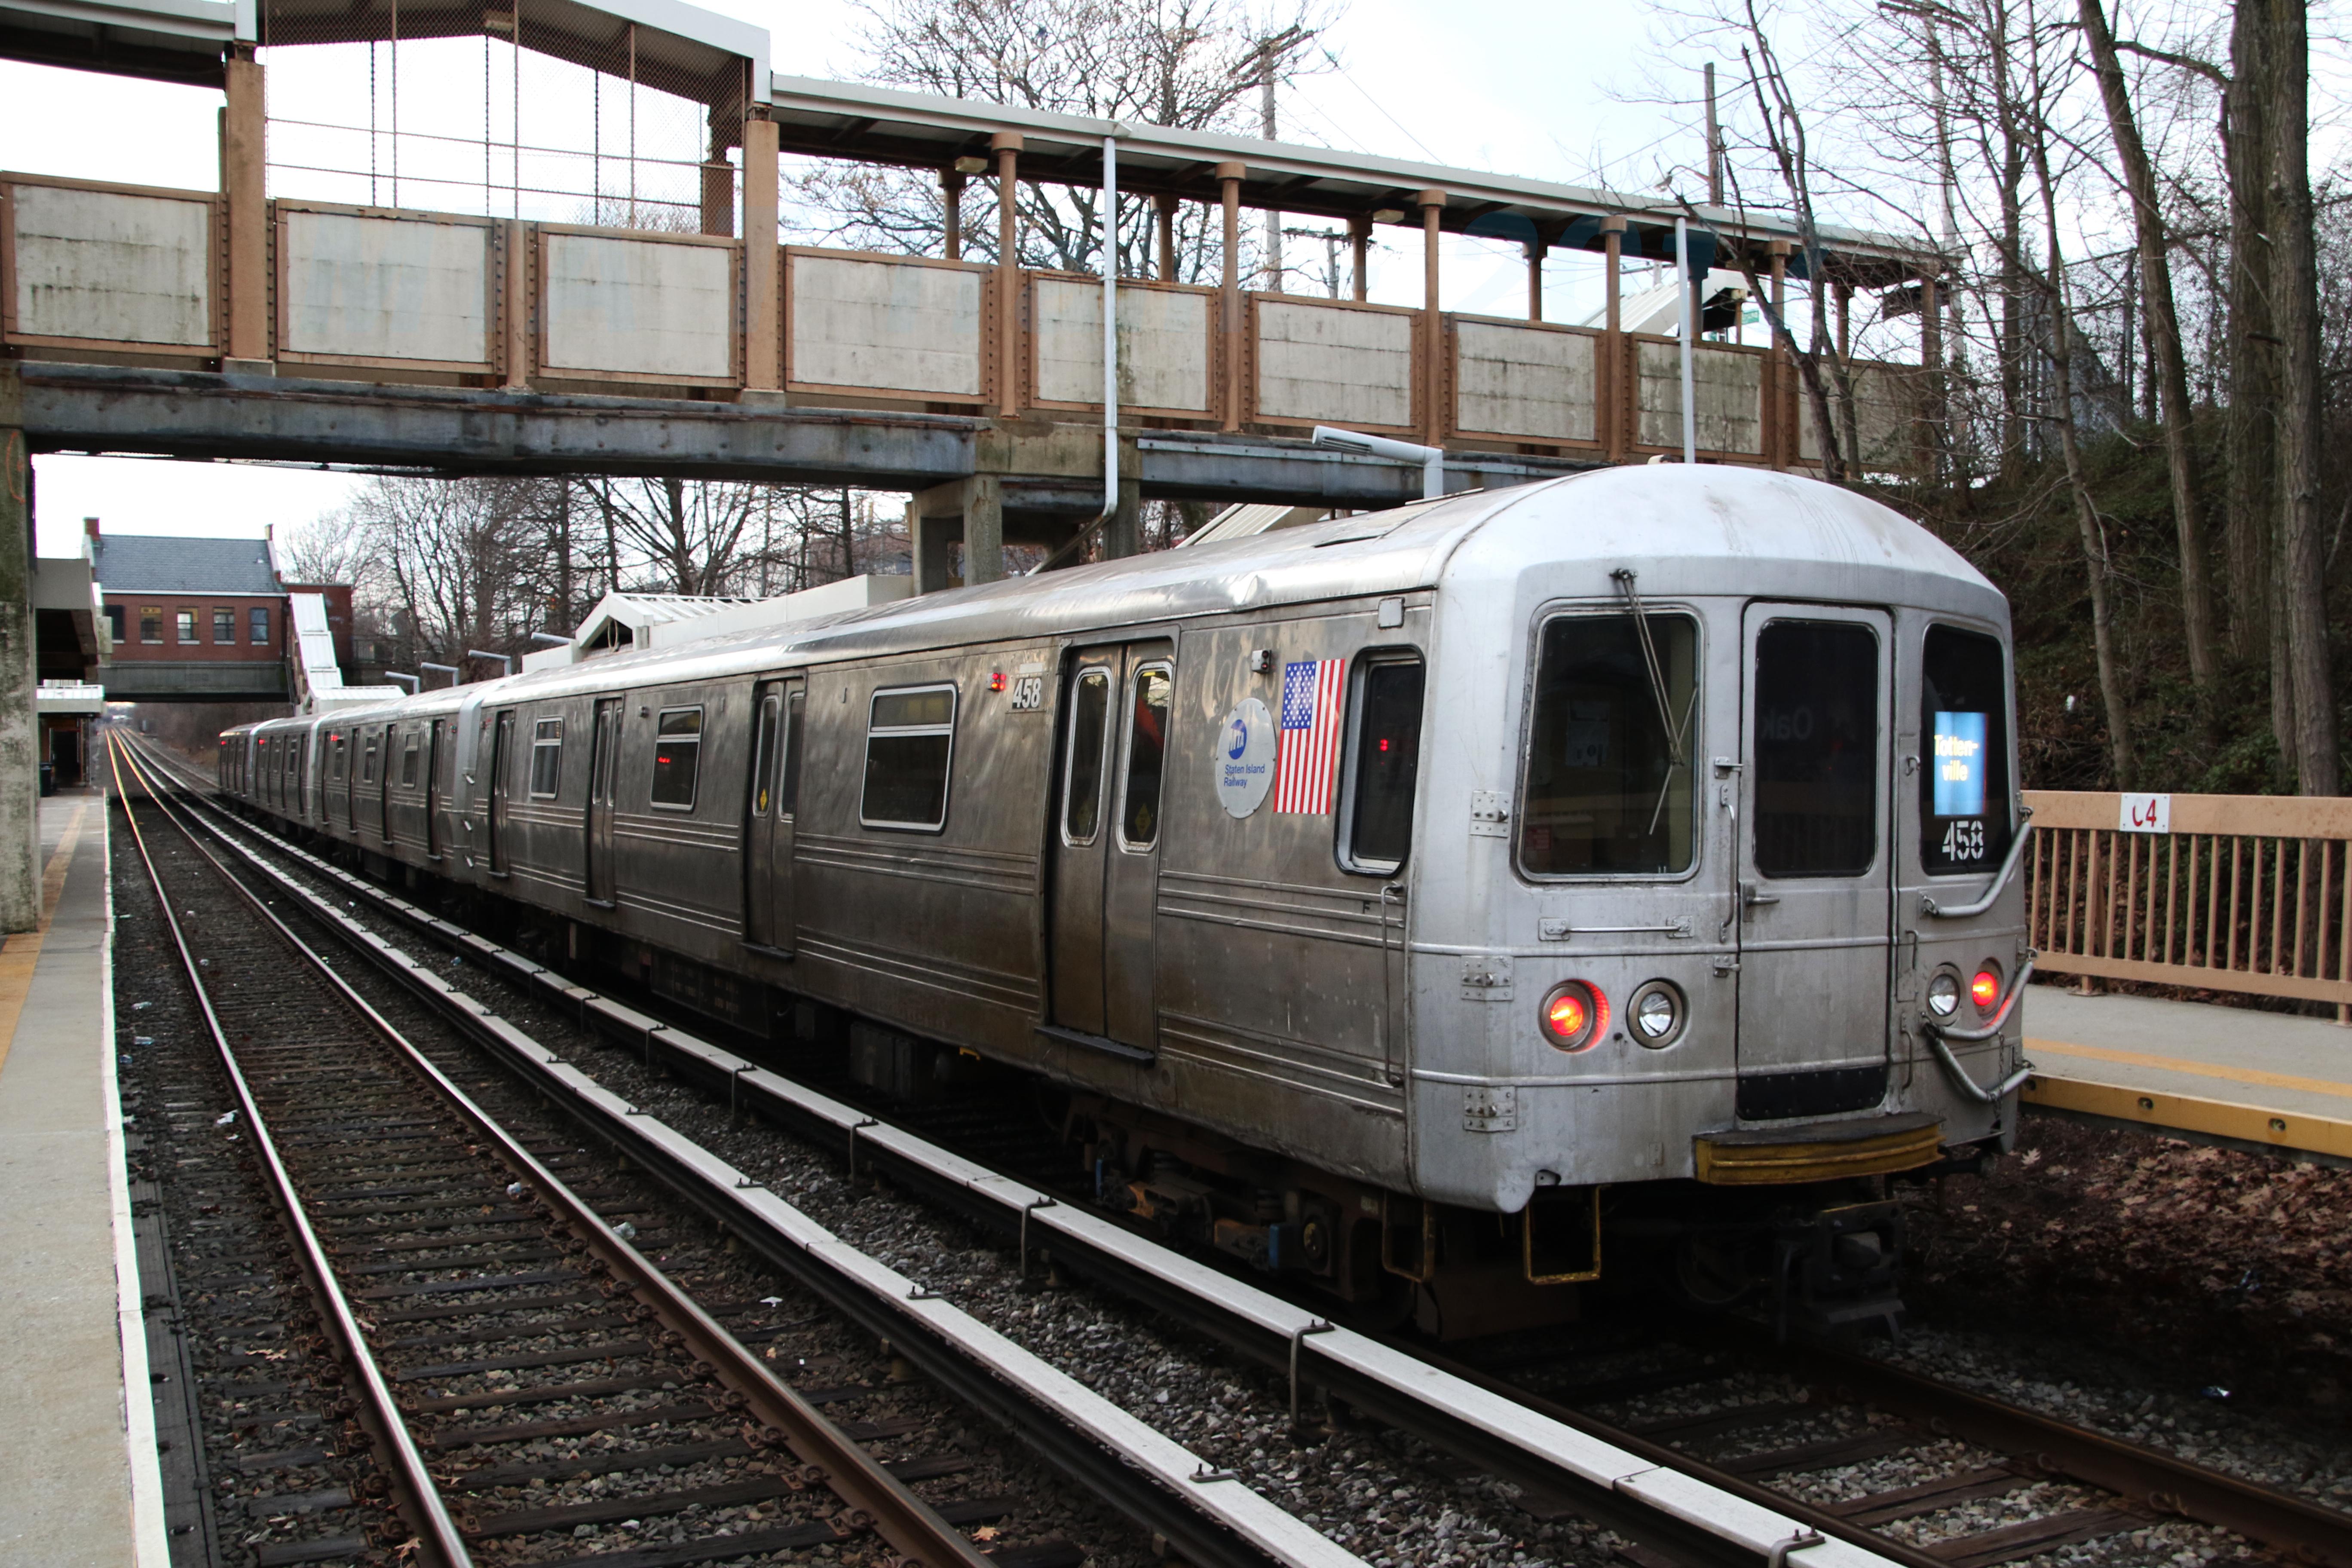 Cars Staten Island Ferrycarter And Cavero Staten Island